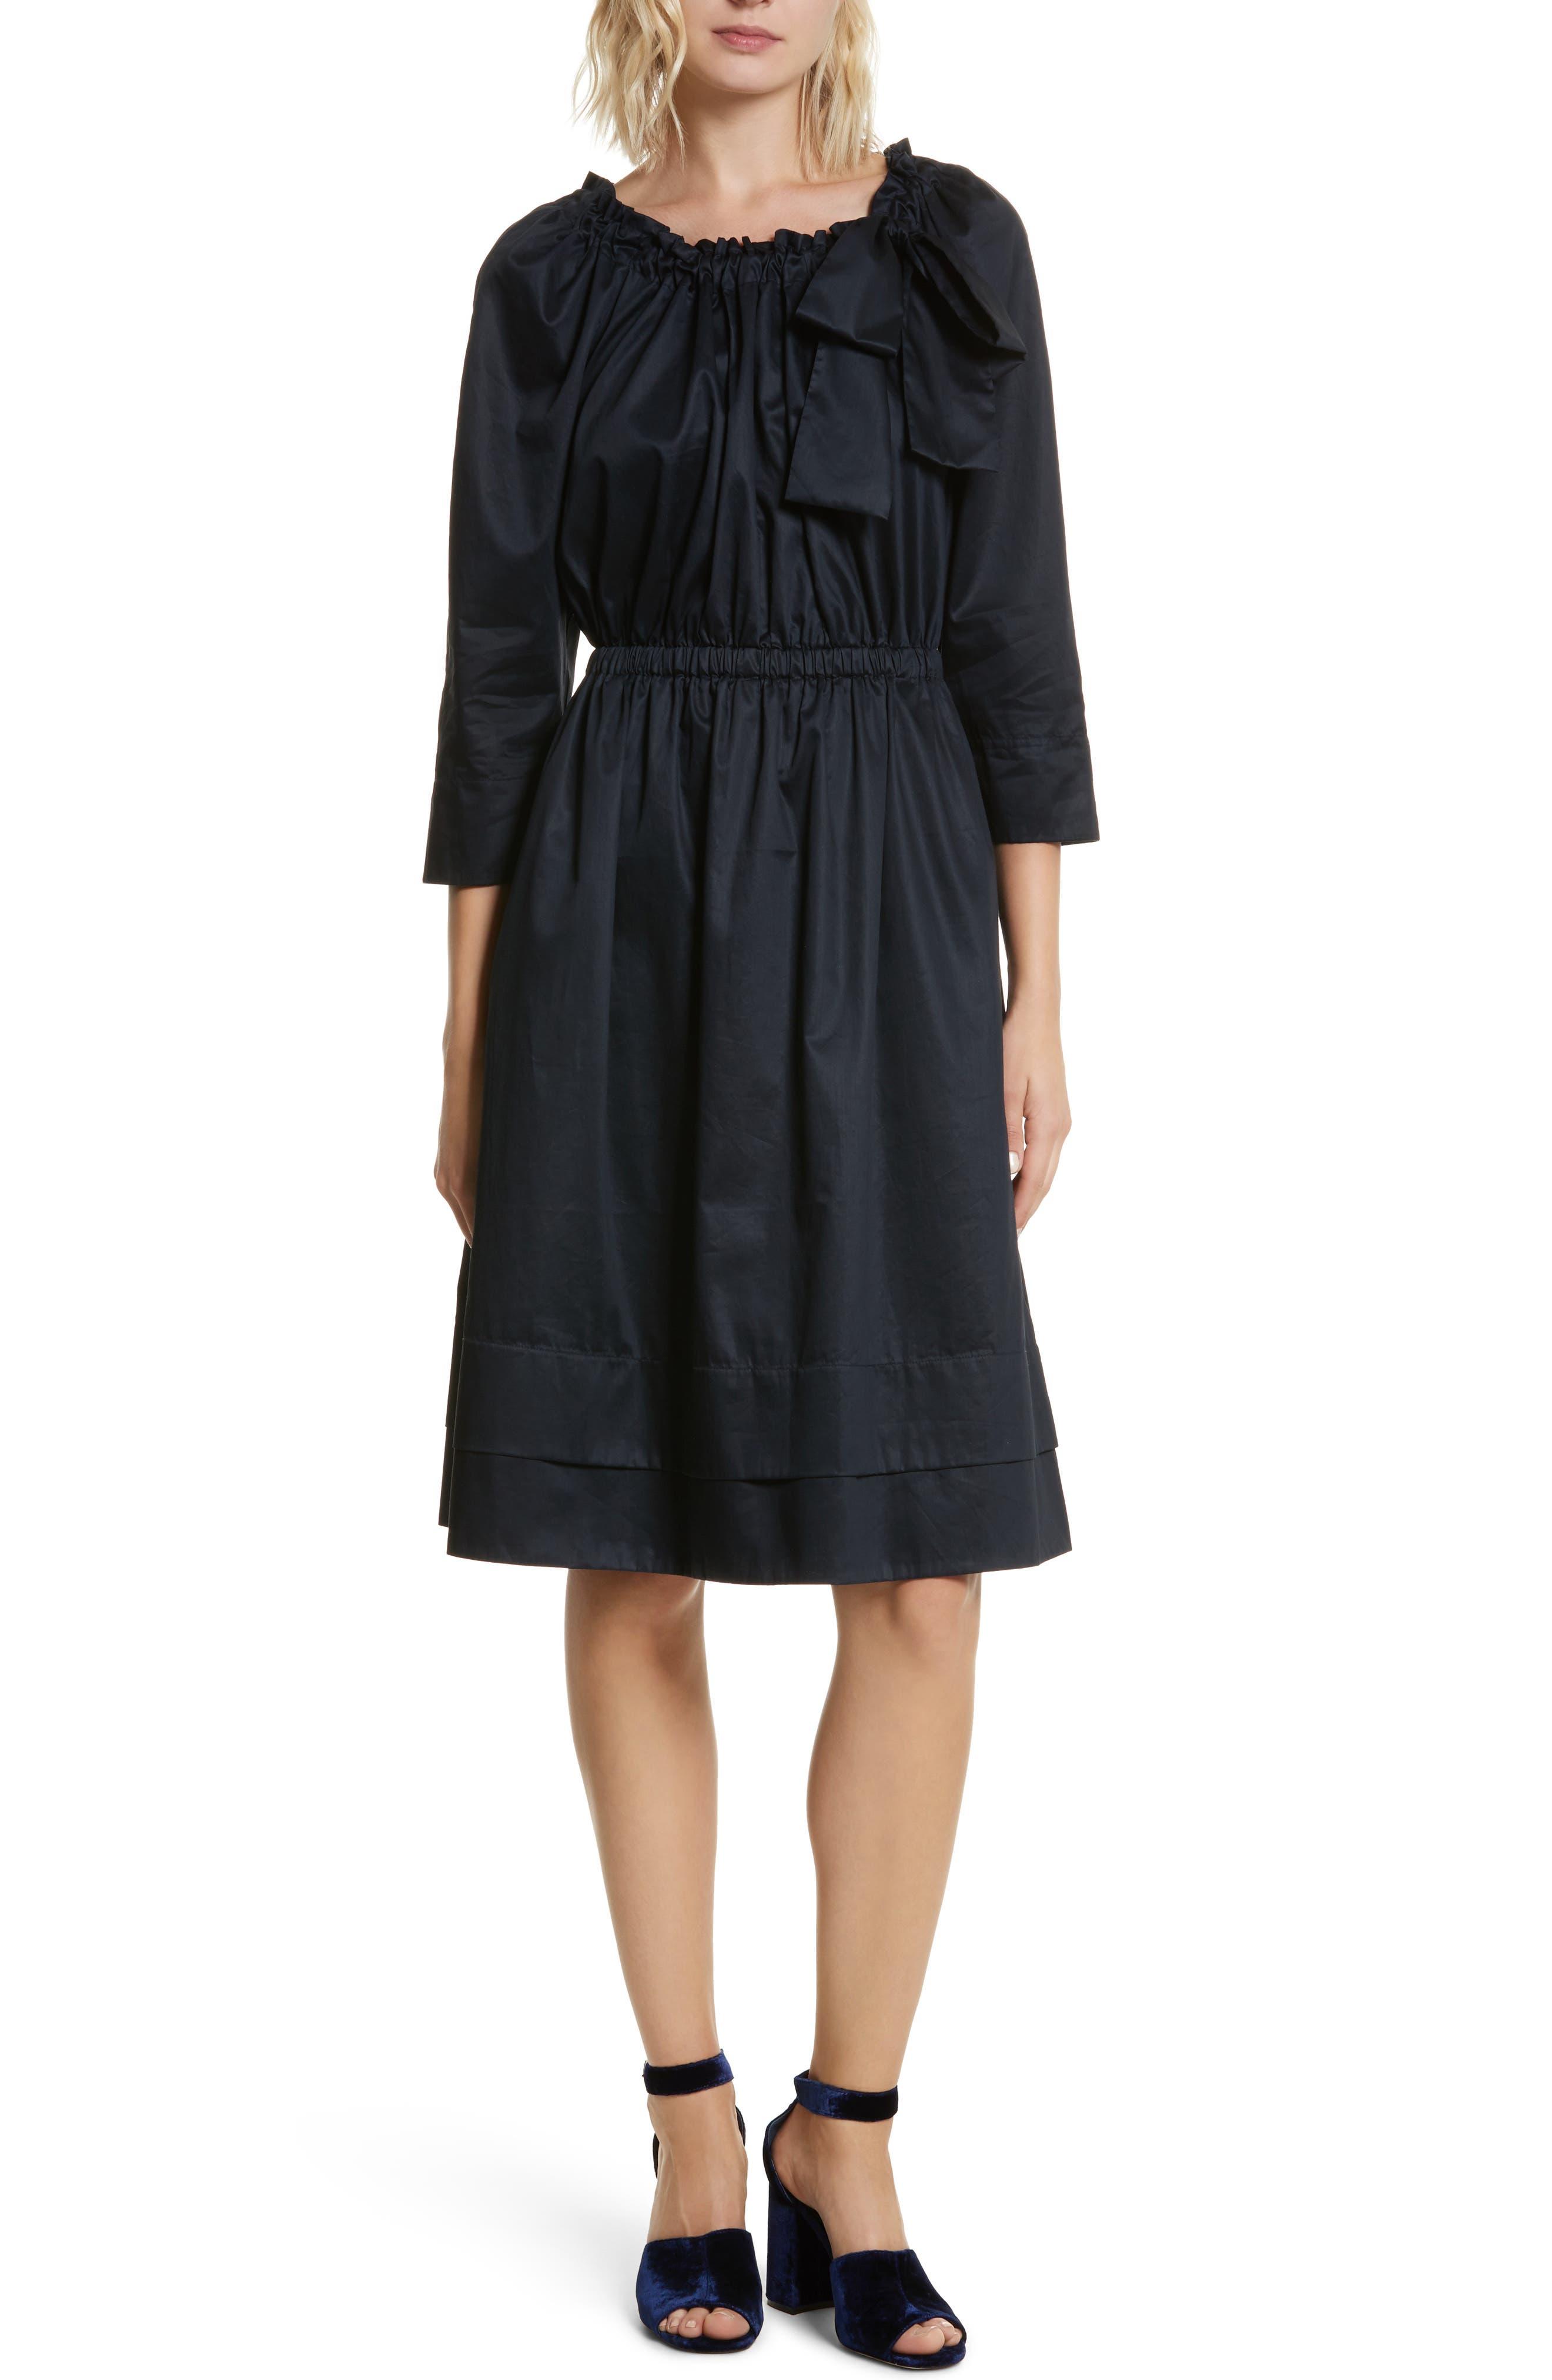 La Vie Rebecca Taylor Bow Neck Washed Sateen Dress